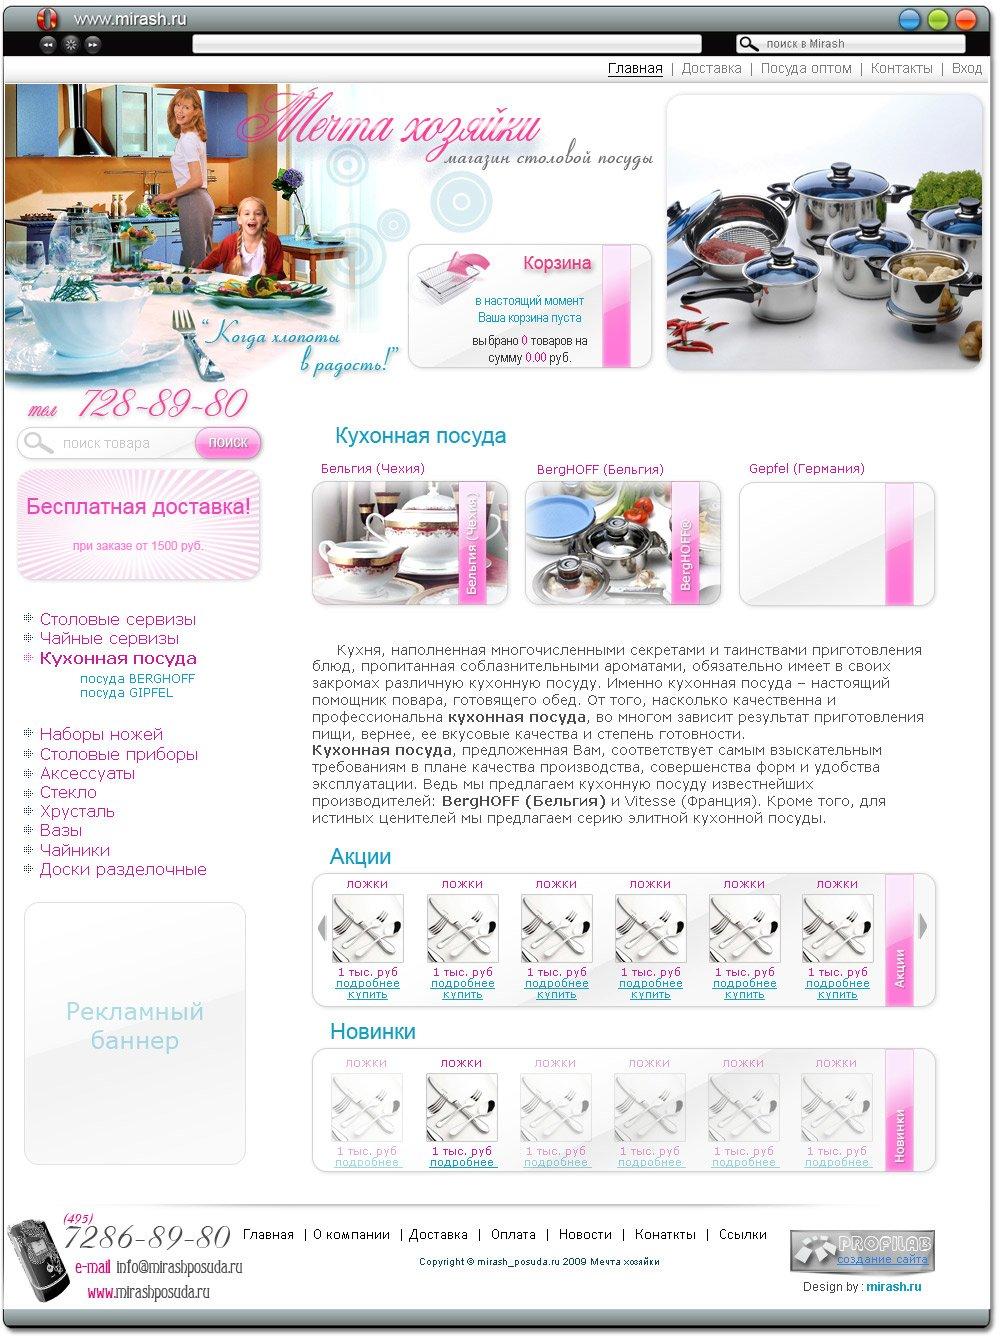 ddd866ca12be9 Веб дизайн сайта Интернет магазина